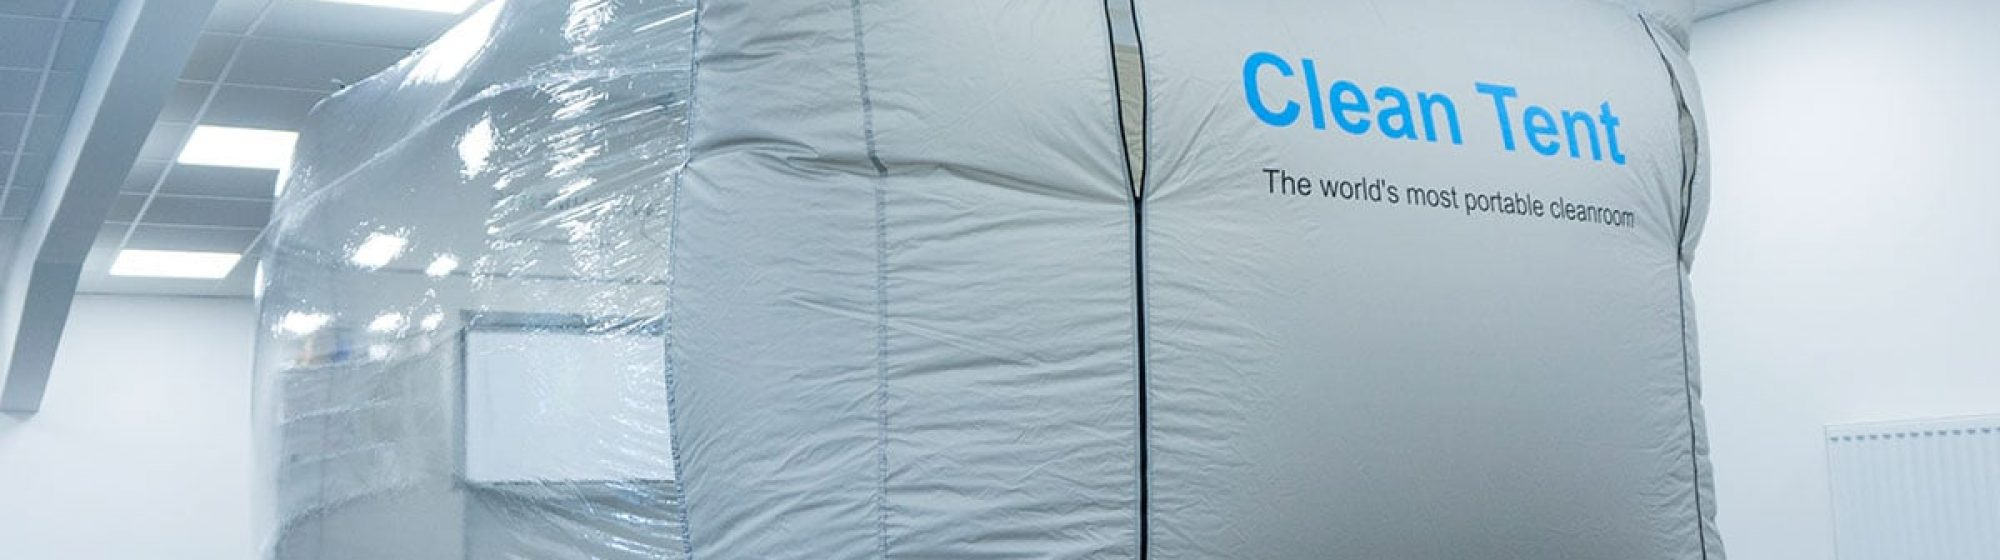 LabHub | Product | Clean Tent 750